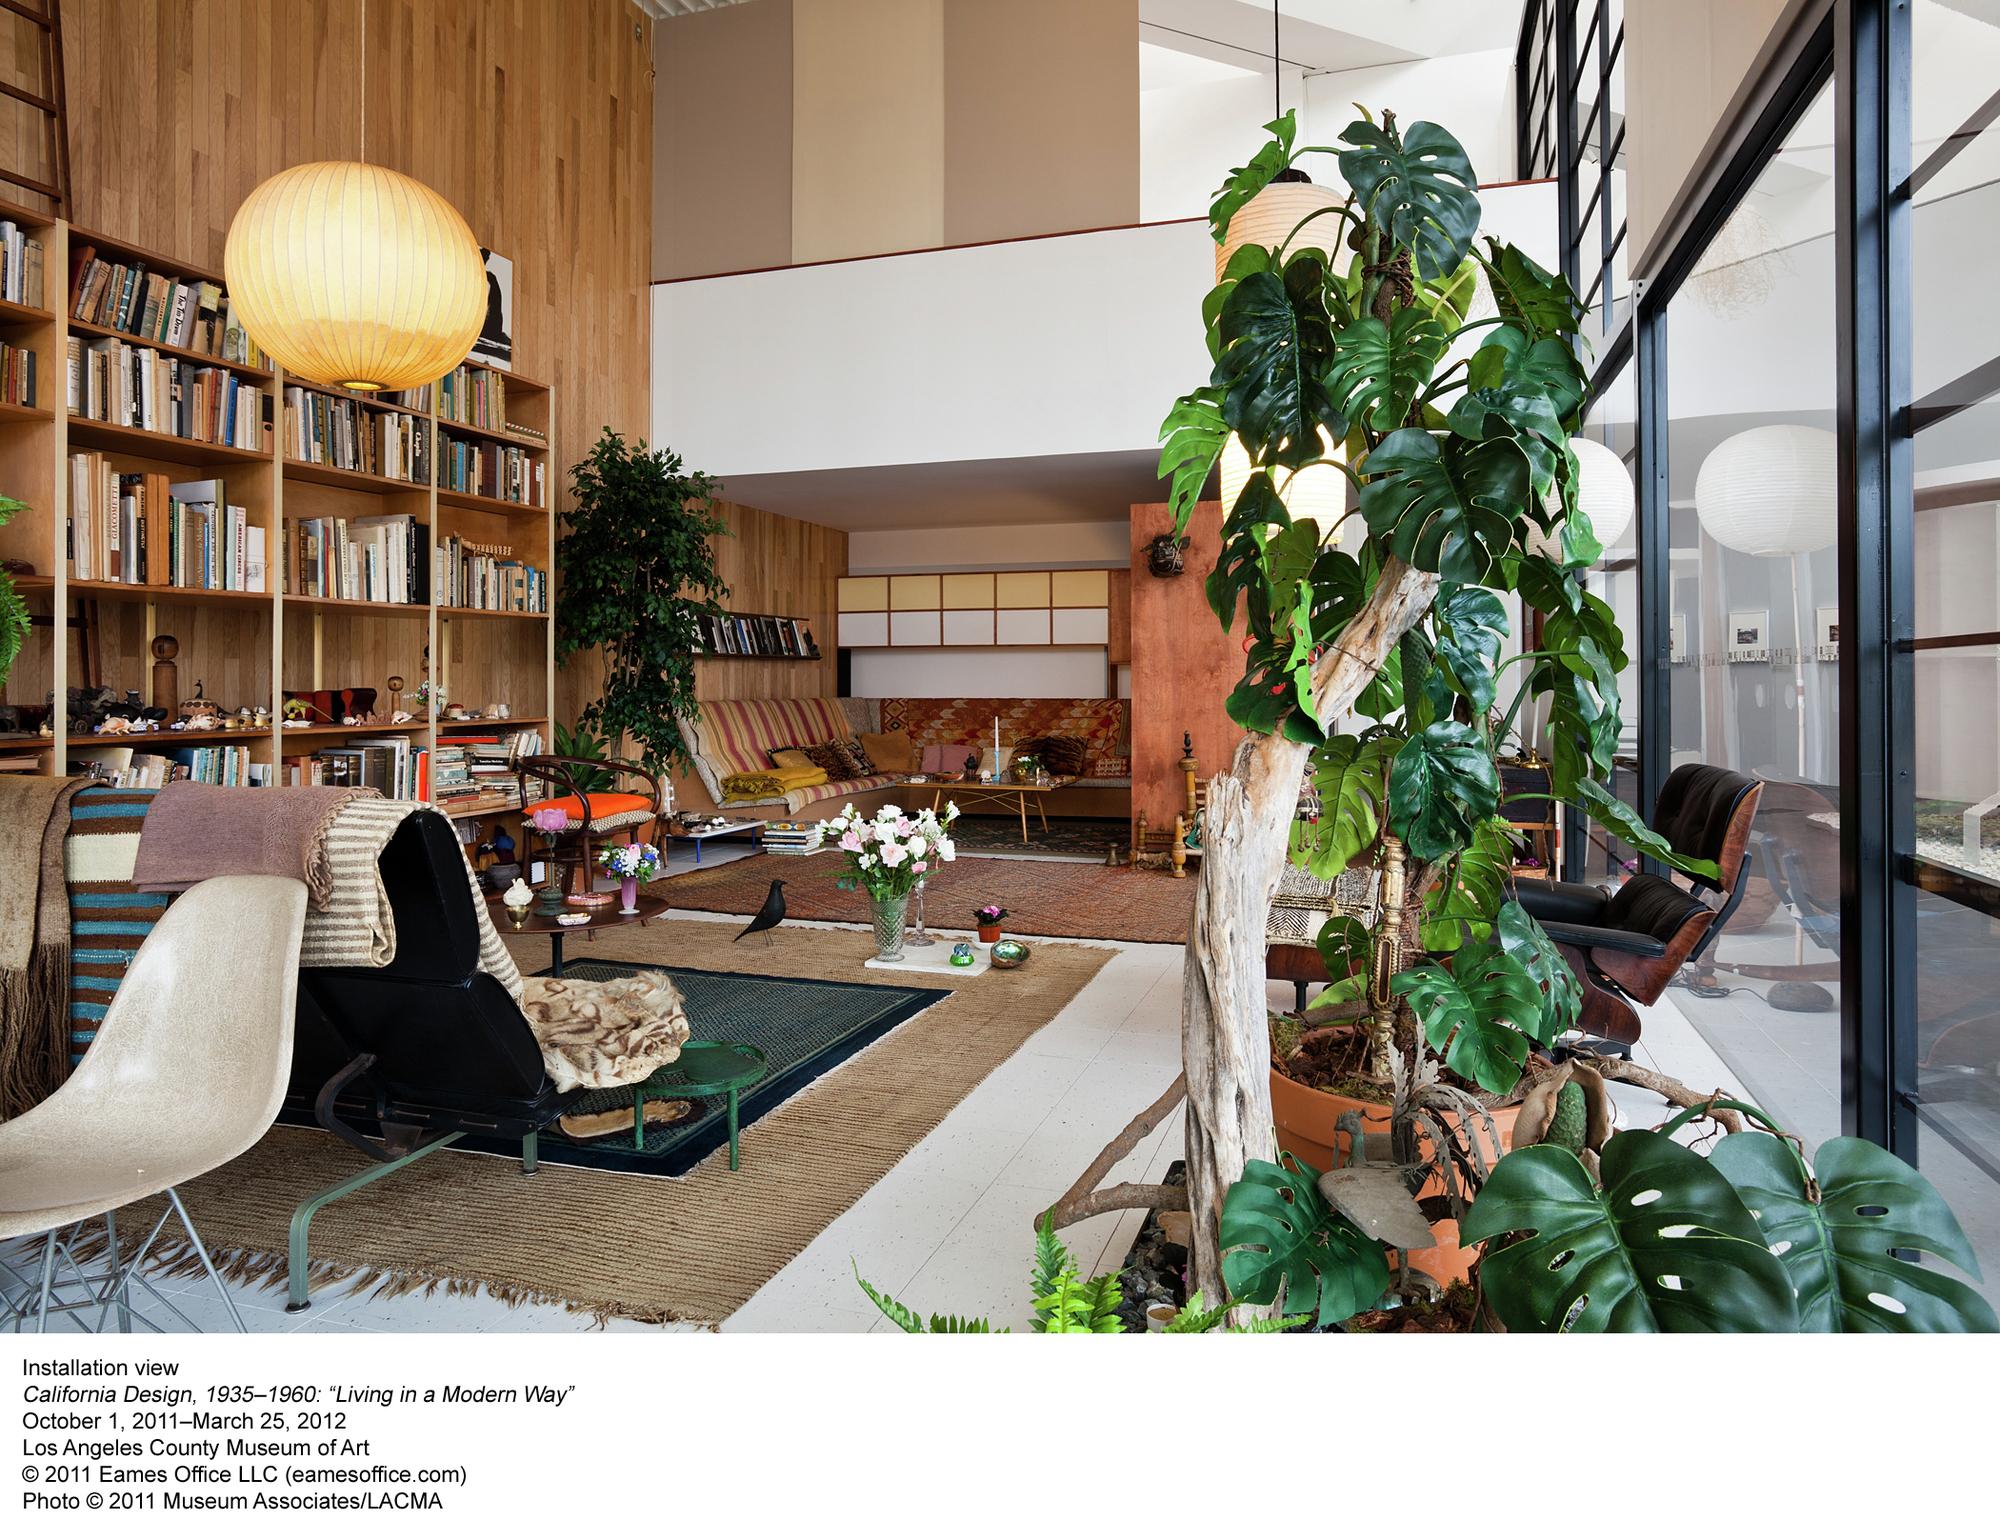 Gallery of Installation for California Design Exhibition